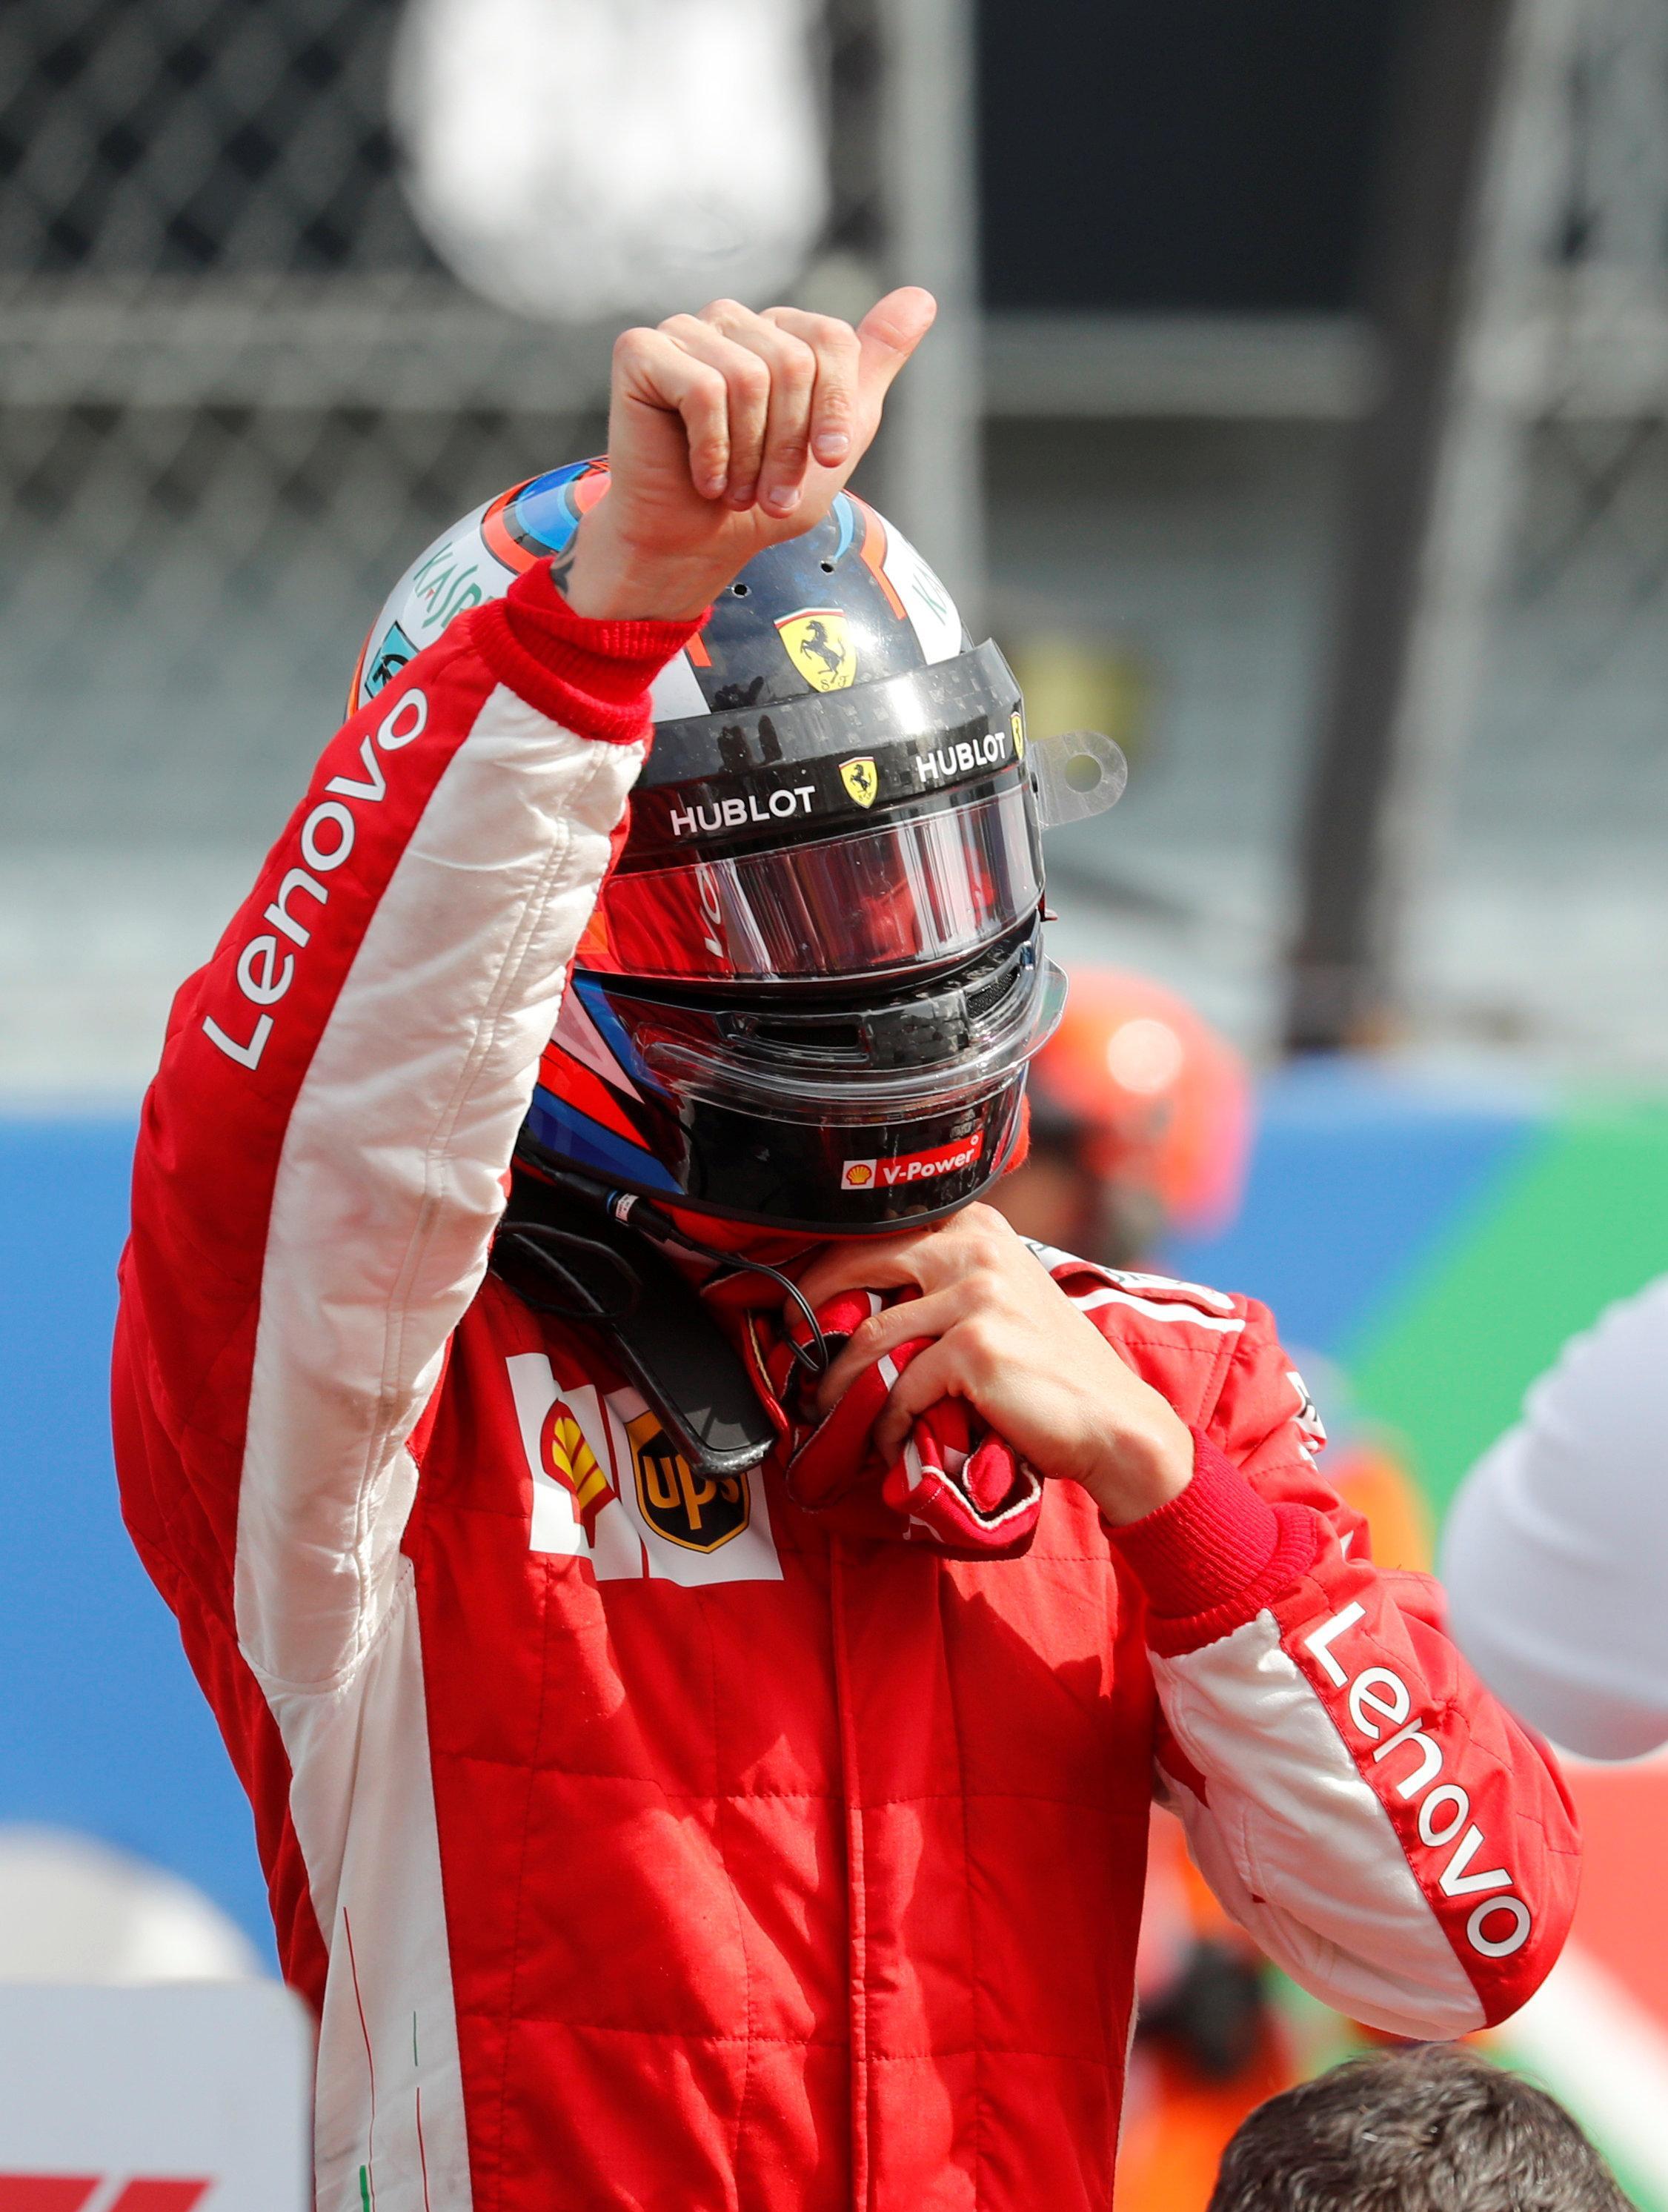 Kimi Raikkonen will sit on pole for tomorrow's Italian Grand Prix